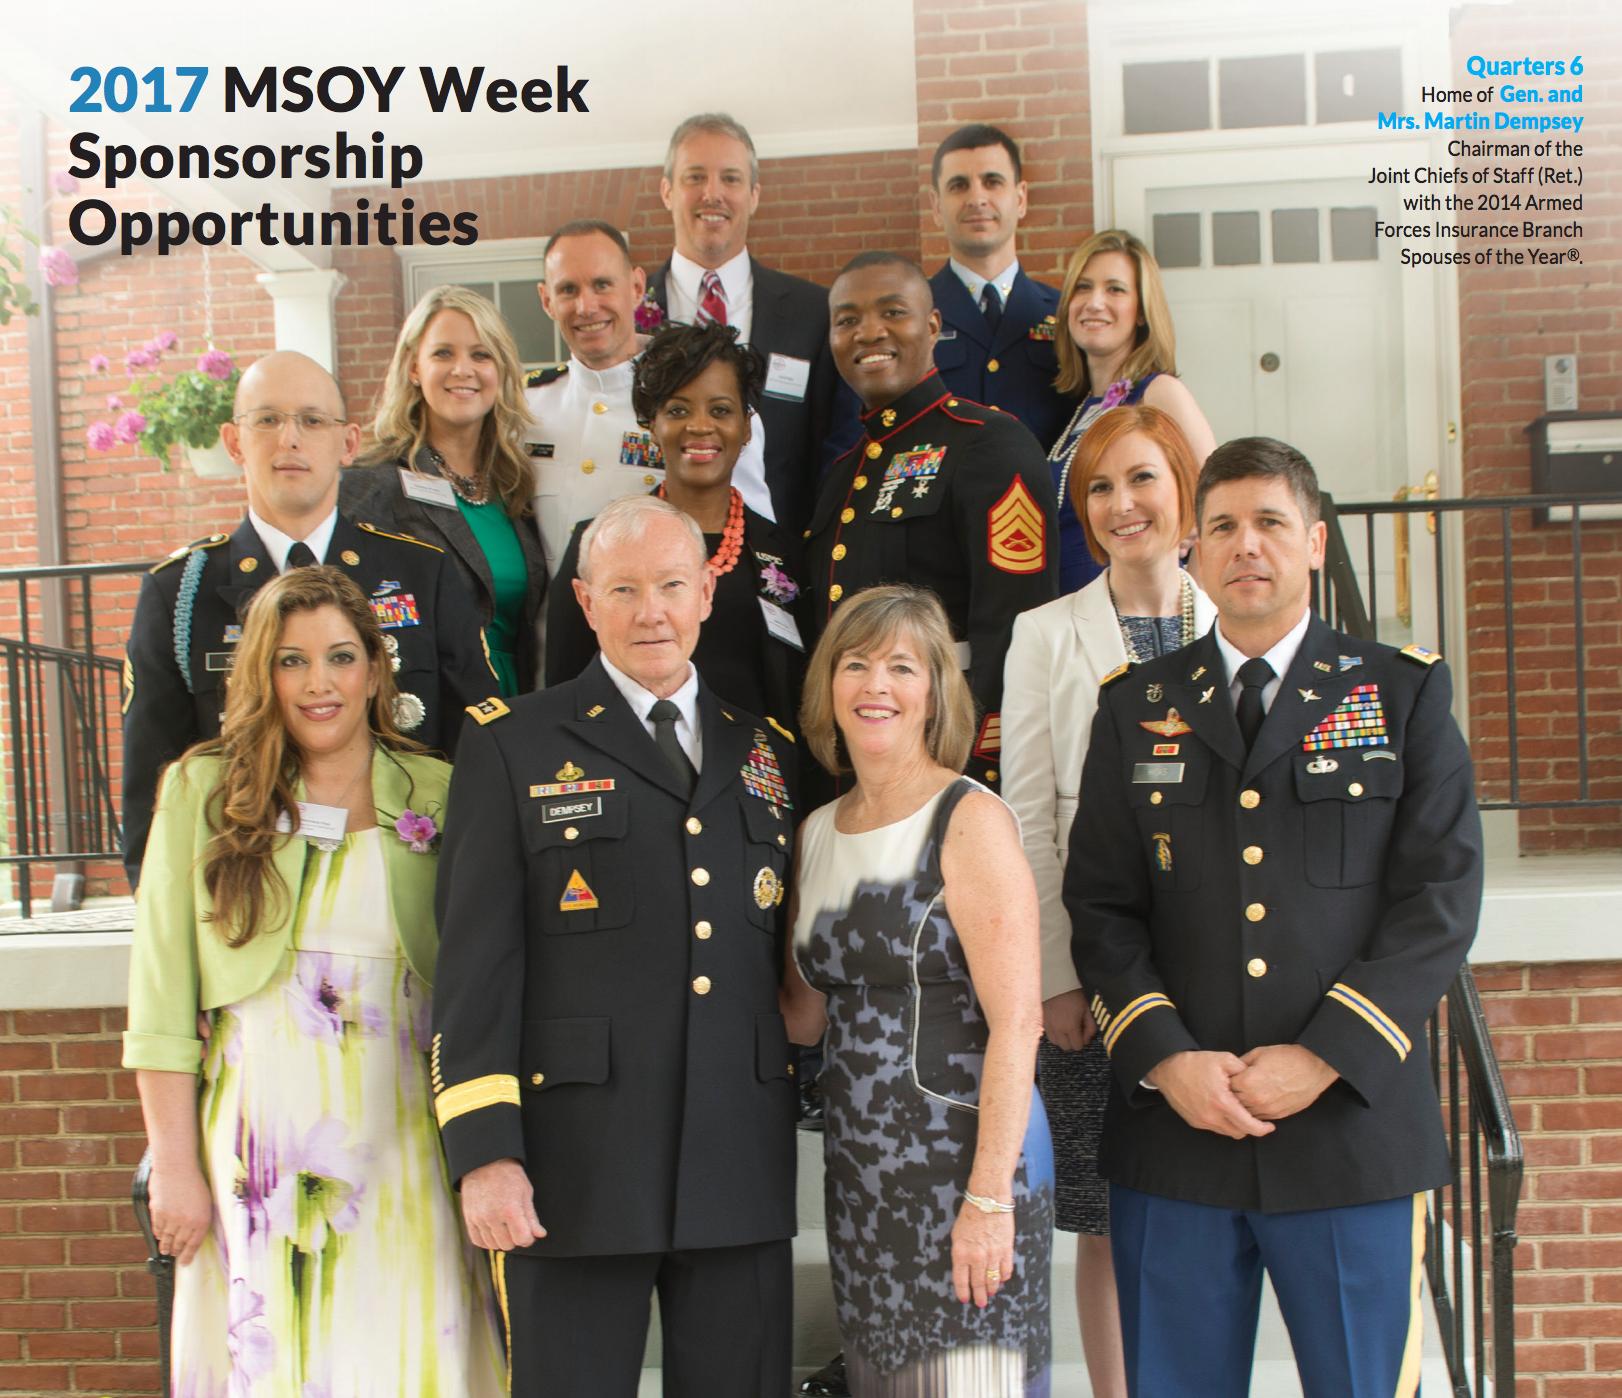 2017 Military Spouse Week - MSOY Week Sponsorship Opportunities